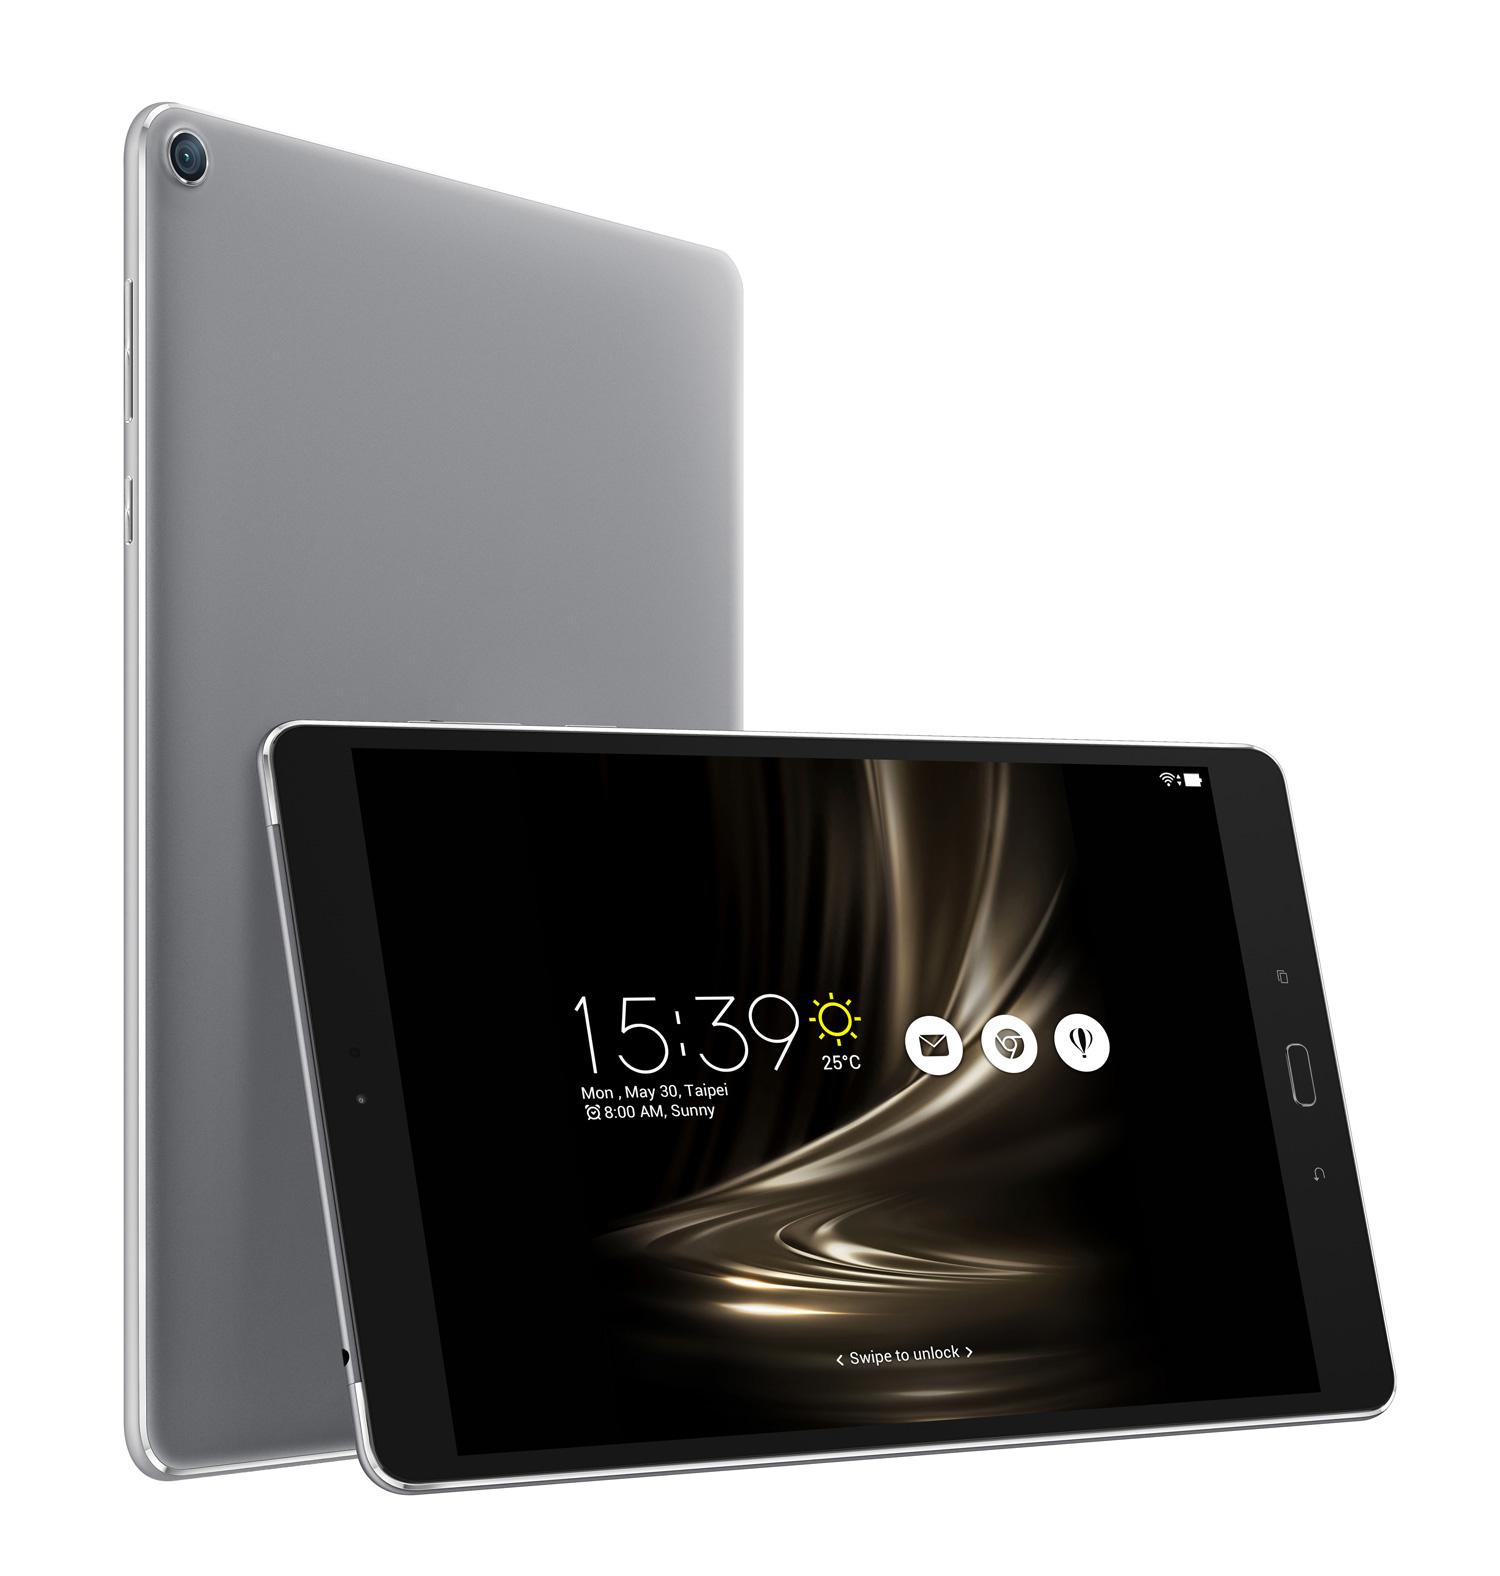 tablette asus zenpad 3s 10 z500m 64 go comparez malin. Black Bedroom Furniture Sets. Home Design Ideas